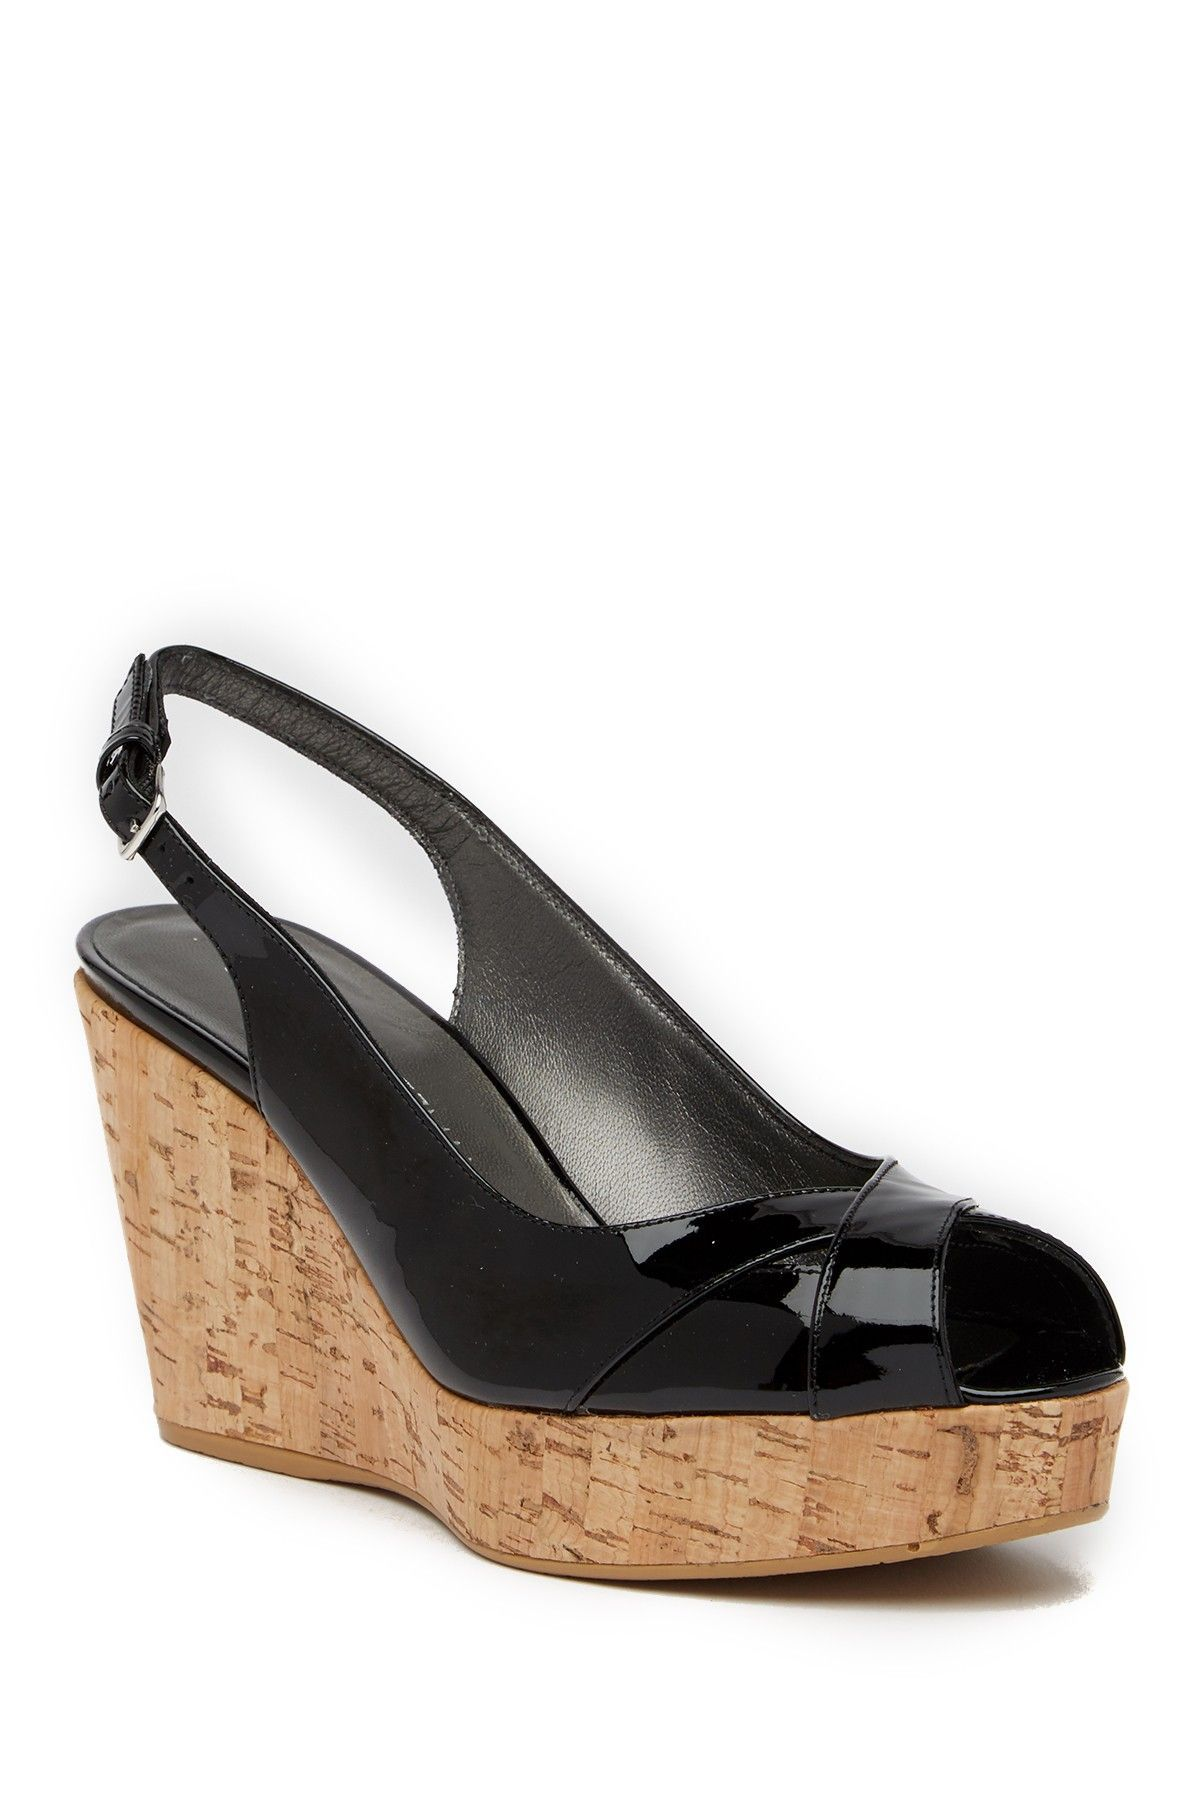 87a87d8785b Vent Peep Toe Wedge Slingback Sandal